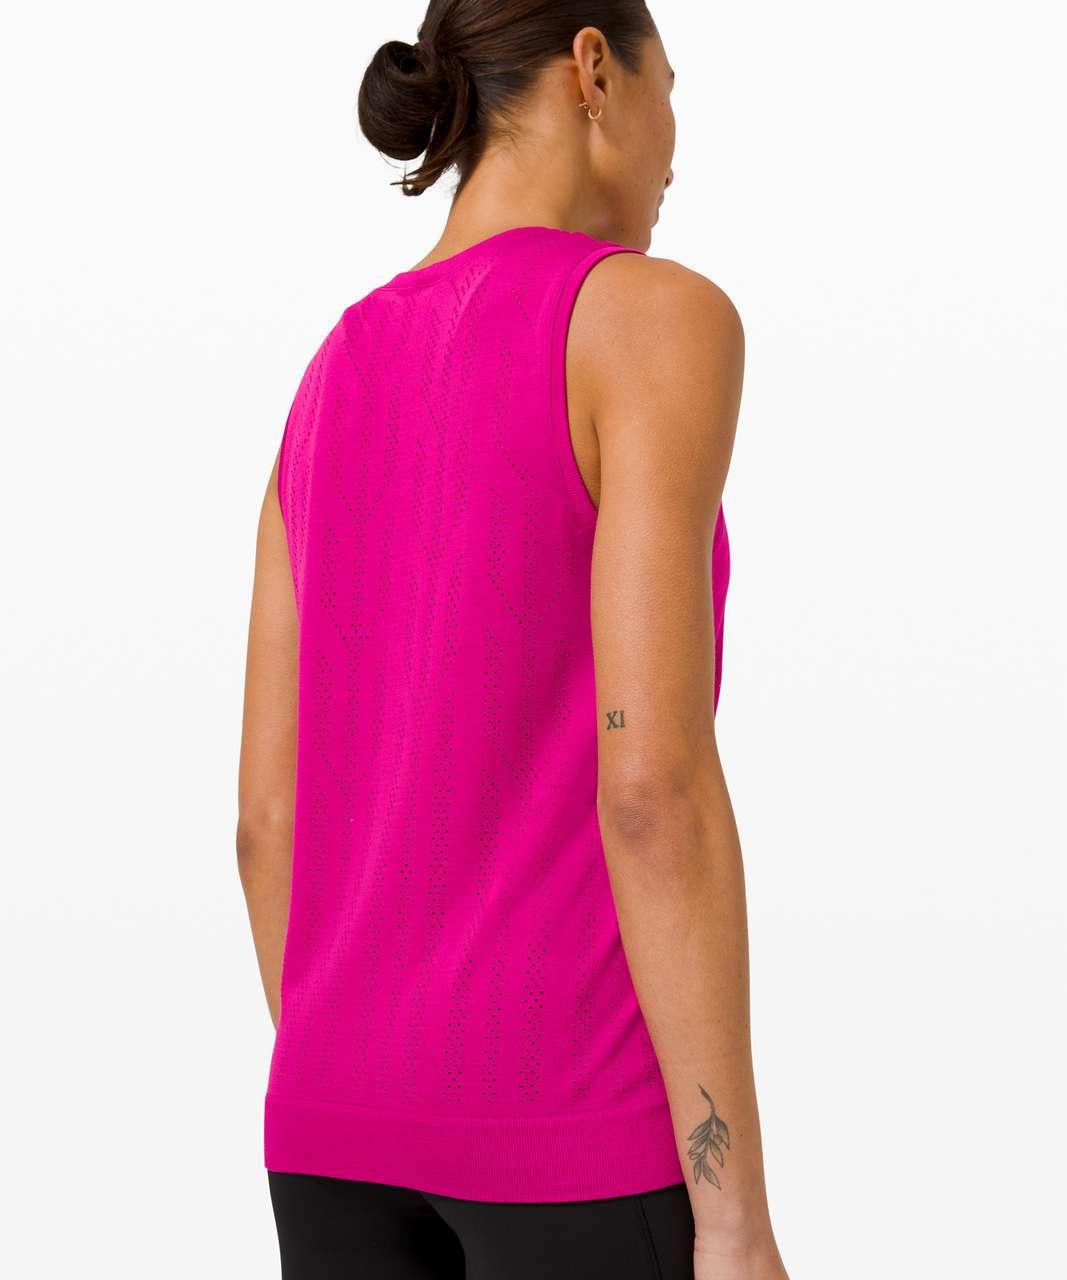 Lululemon Swiftly Breathe Muscle Tank Top *Fletching Lines - Fletching Lines Ripened Raspberry